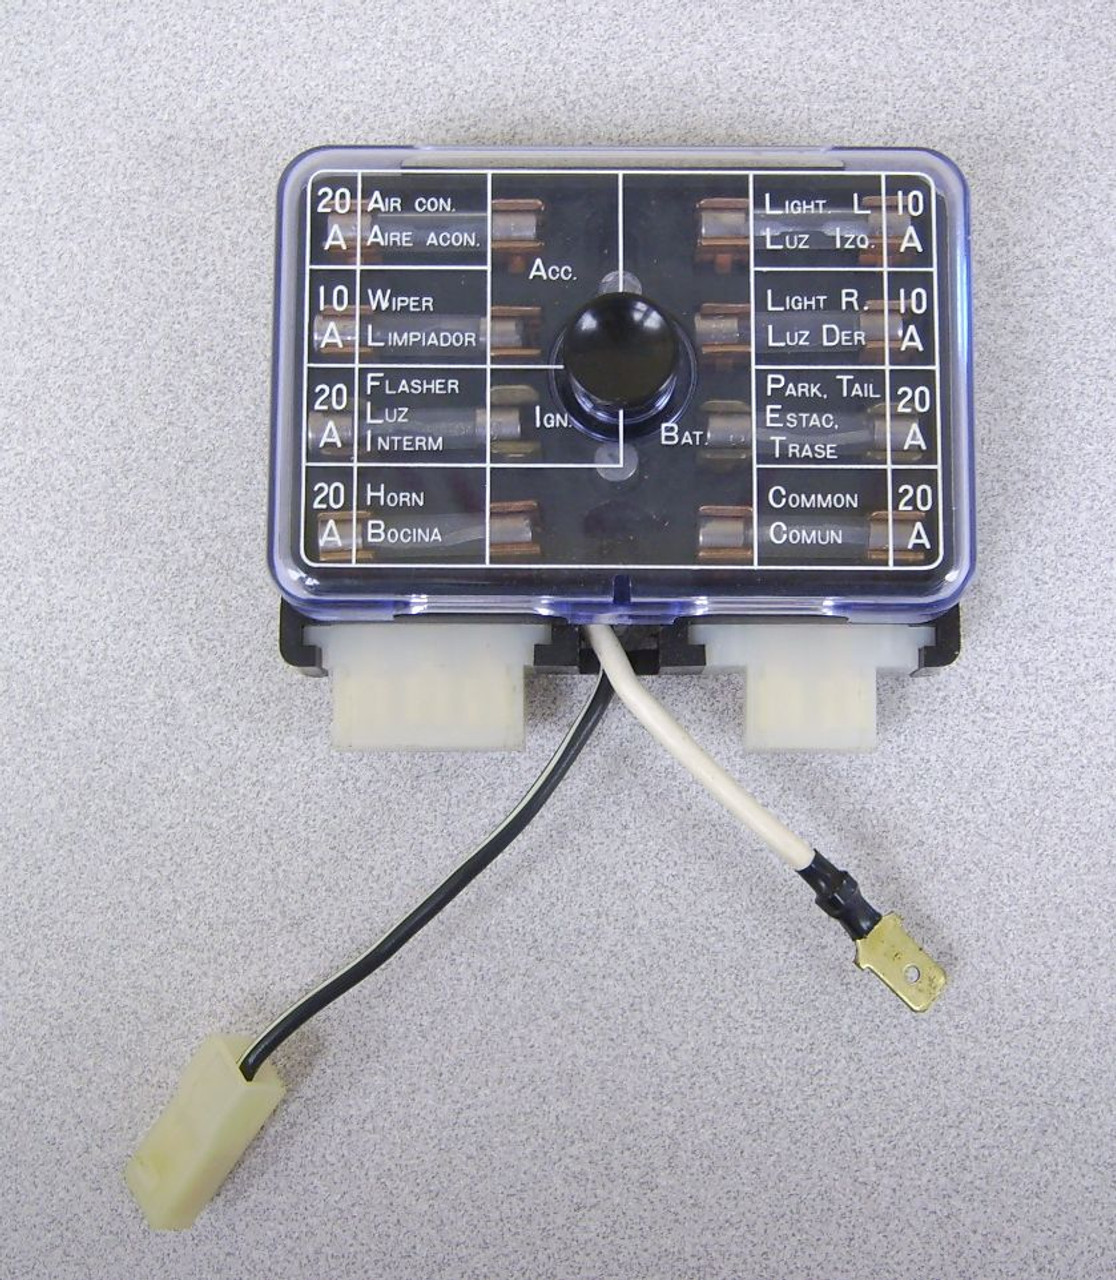 datsun 510 fuse box cover wiring diagrams export blown fuse in breaker box datsun fuse box [ 1116 x 1280 Pixel ]